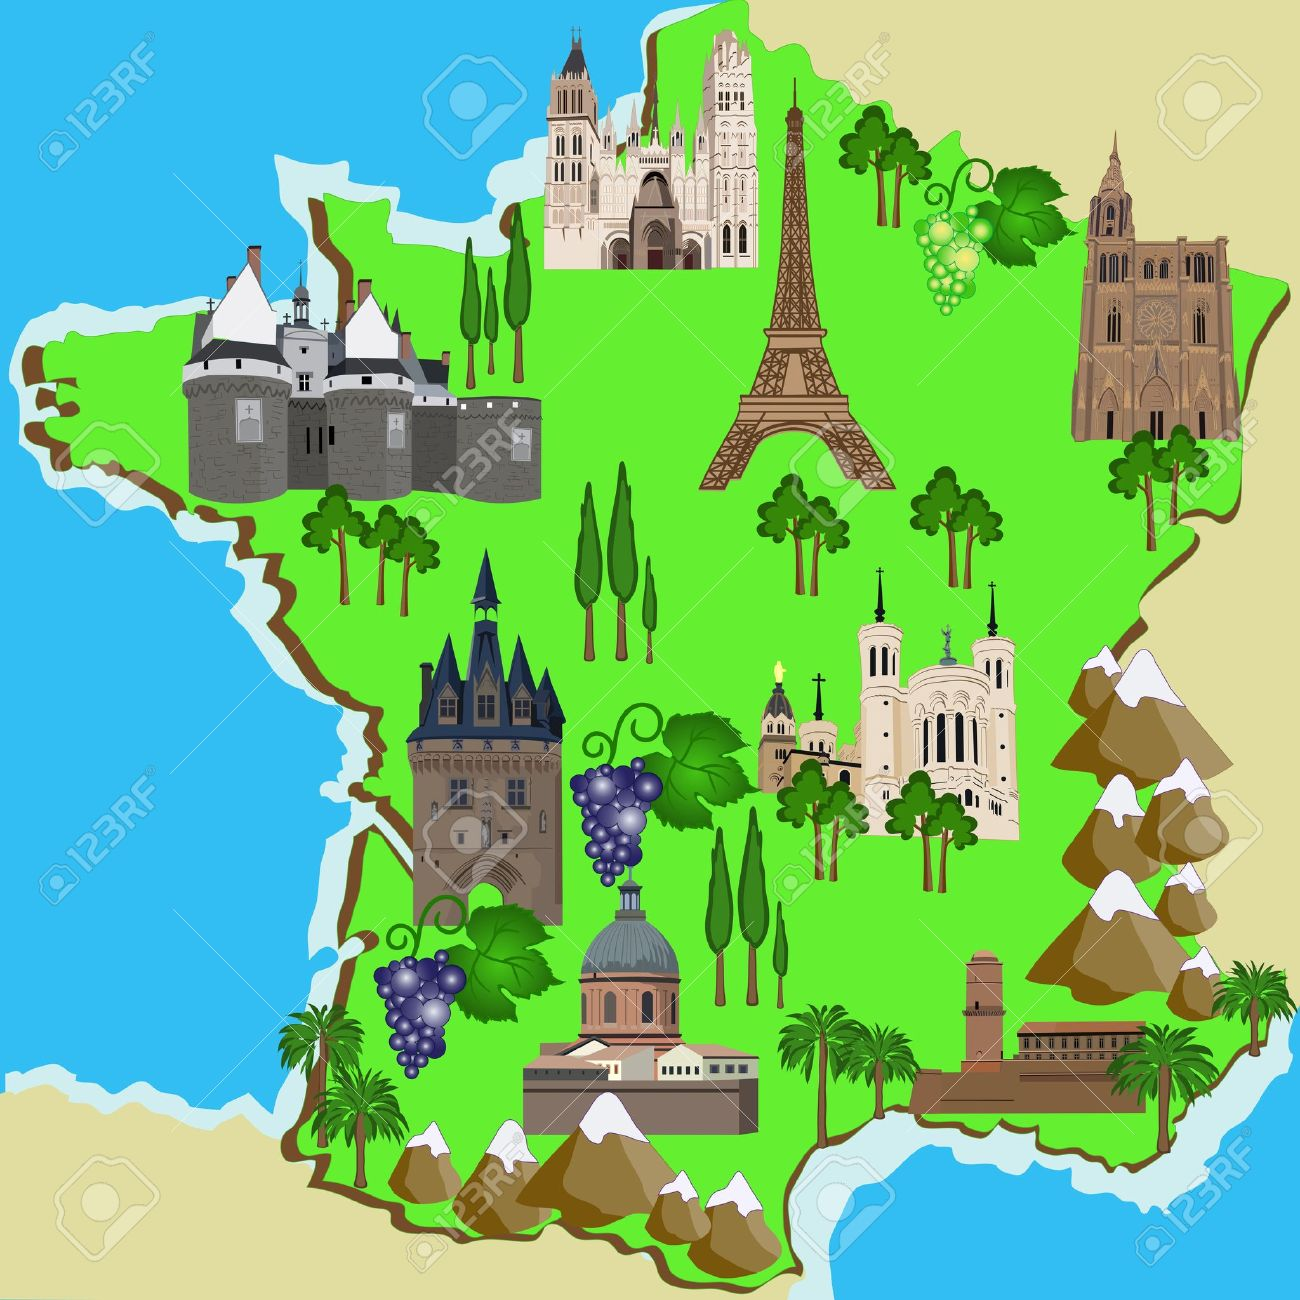 Mapa Turistico De Francia.Vector Mapa Turistico De Francia